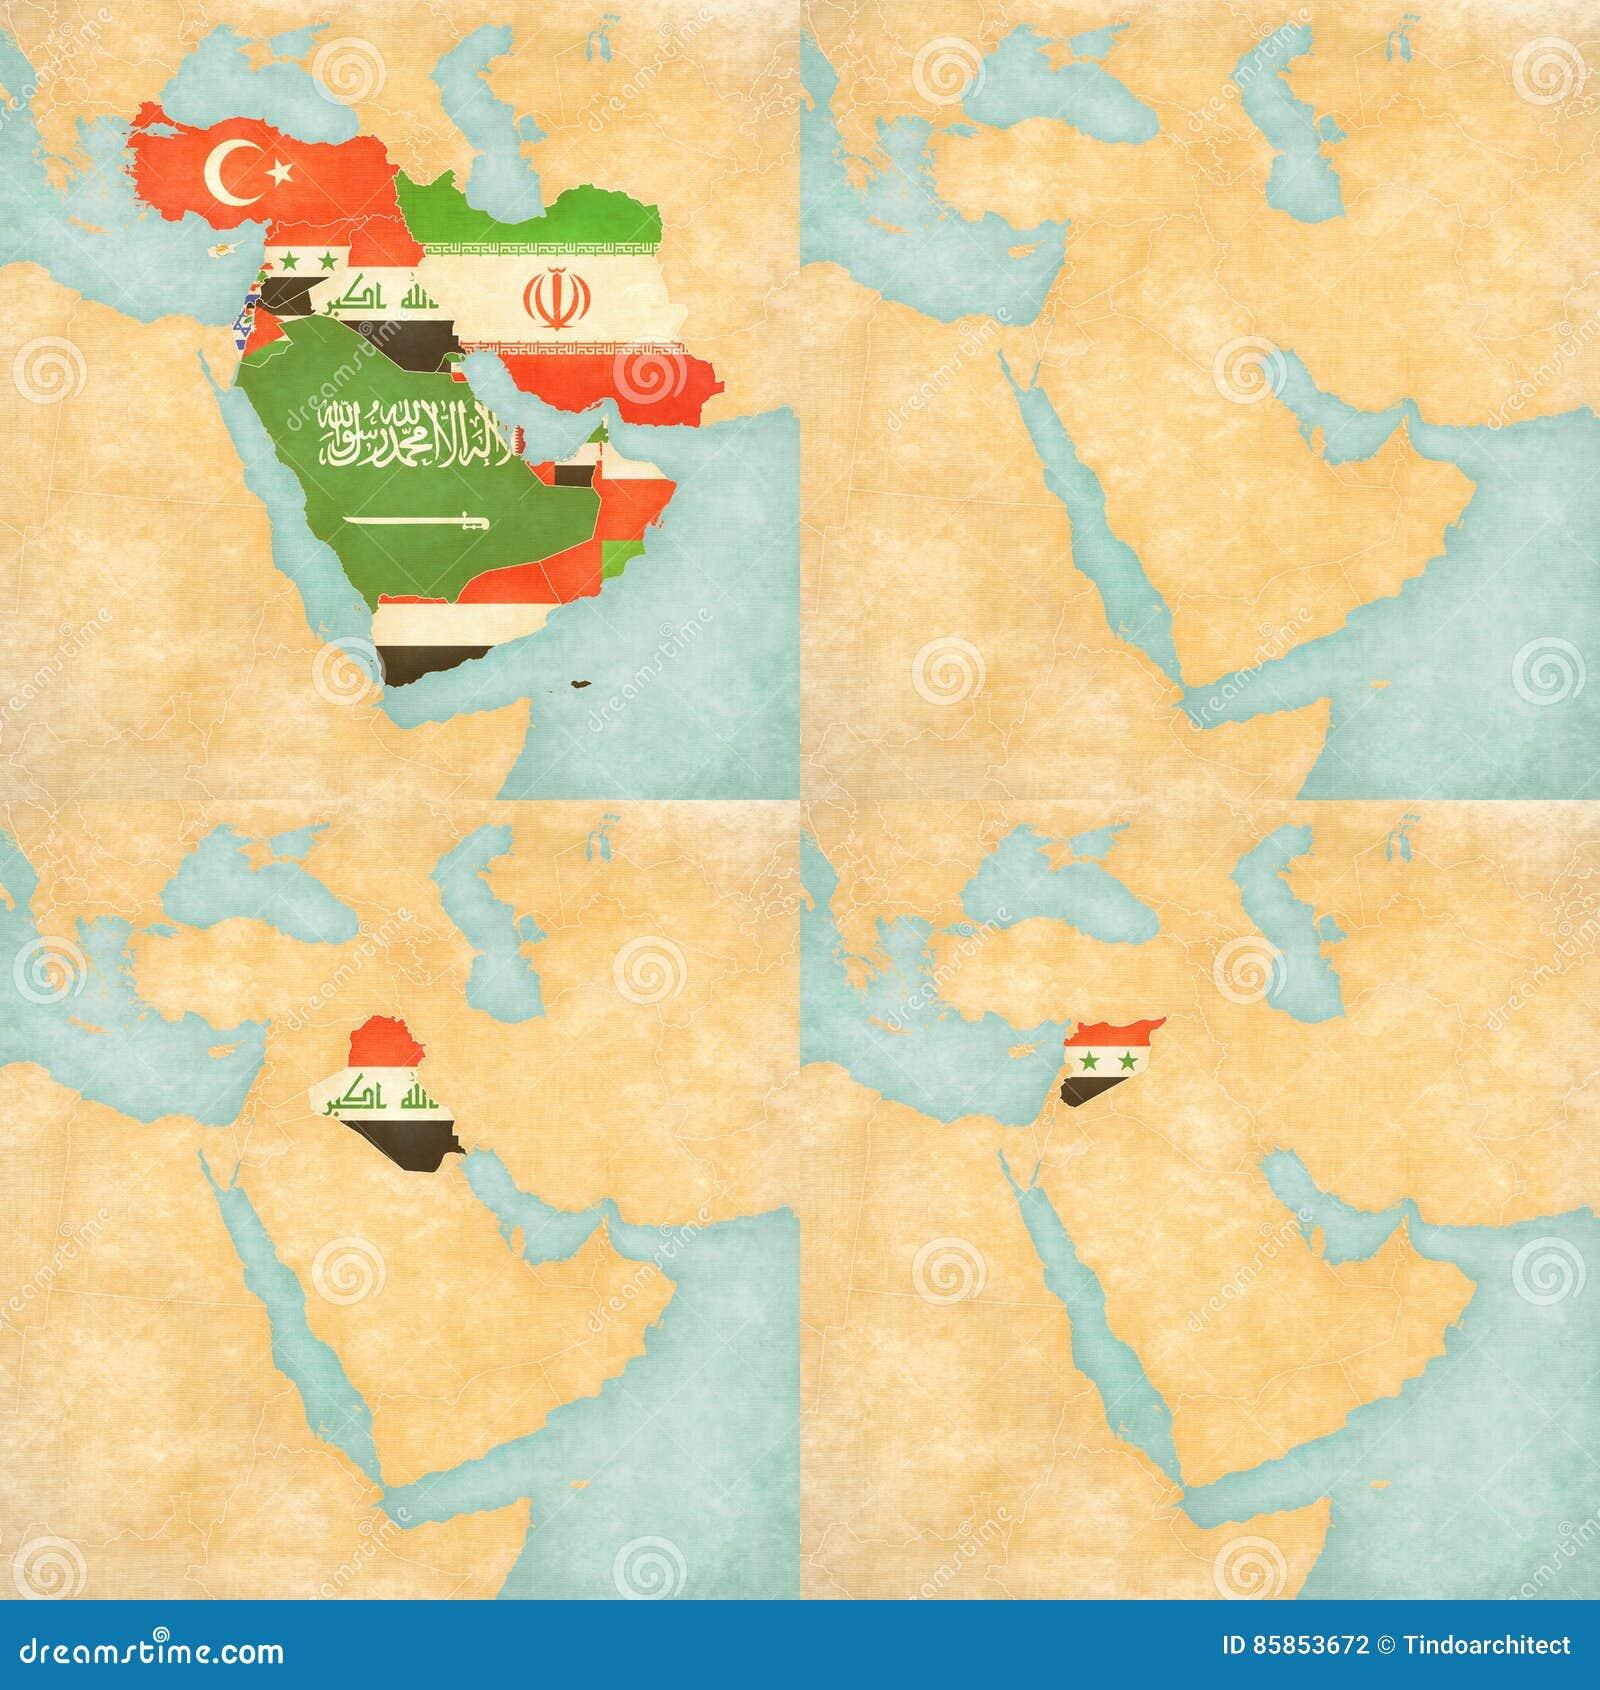 Syrien Irak Karte.Karte Des Mittlere Ostens Asien Alle Lander Leere Karte